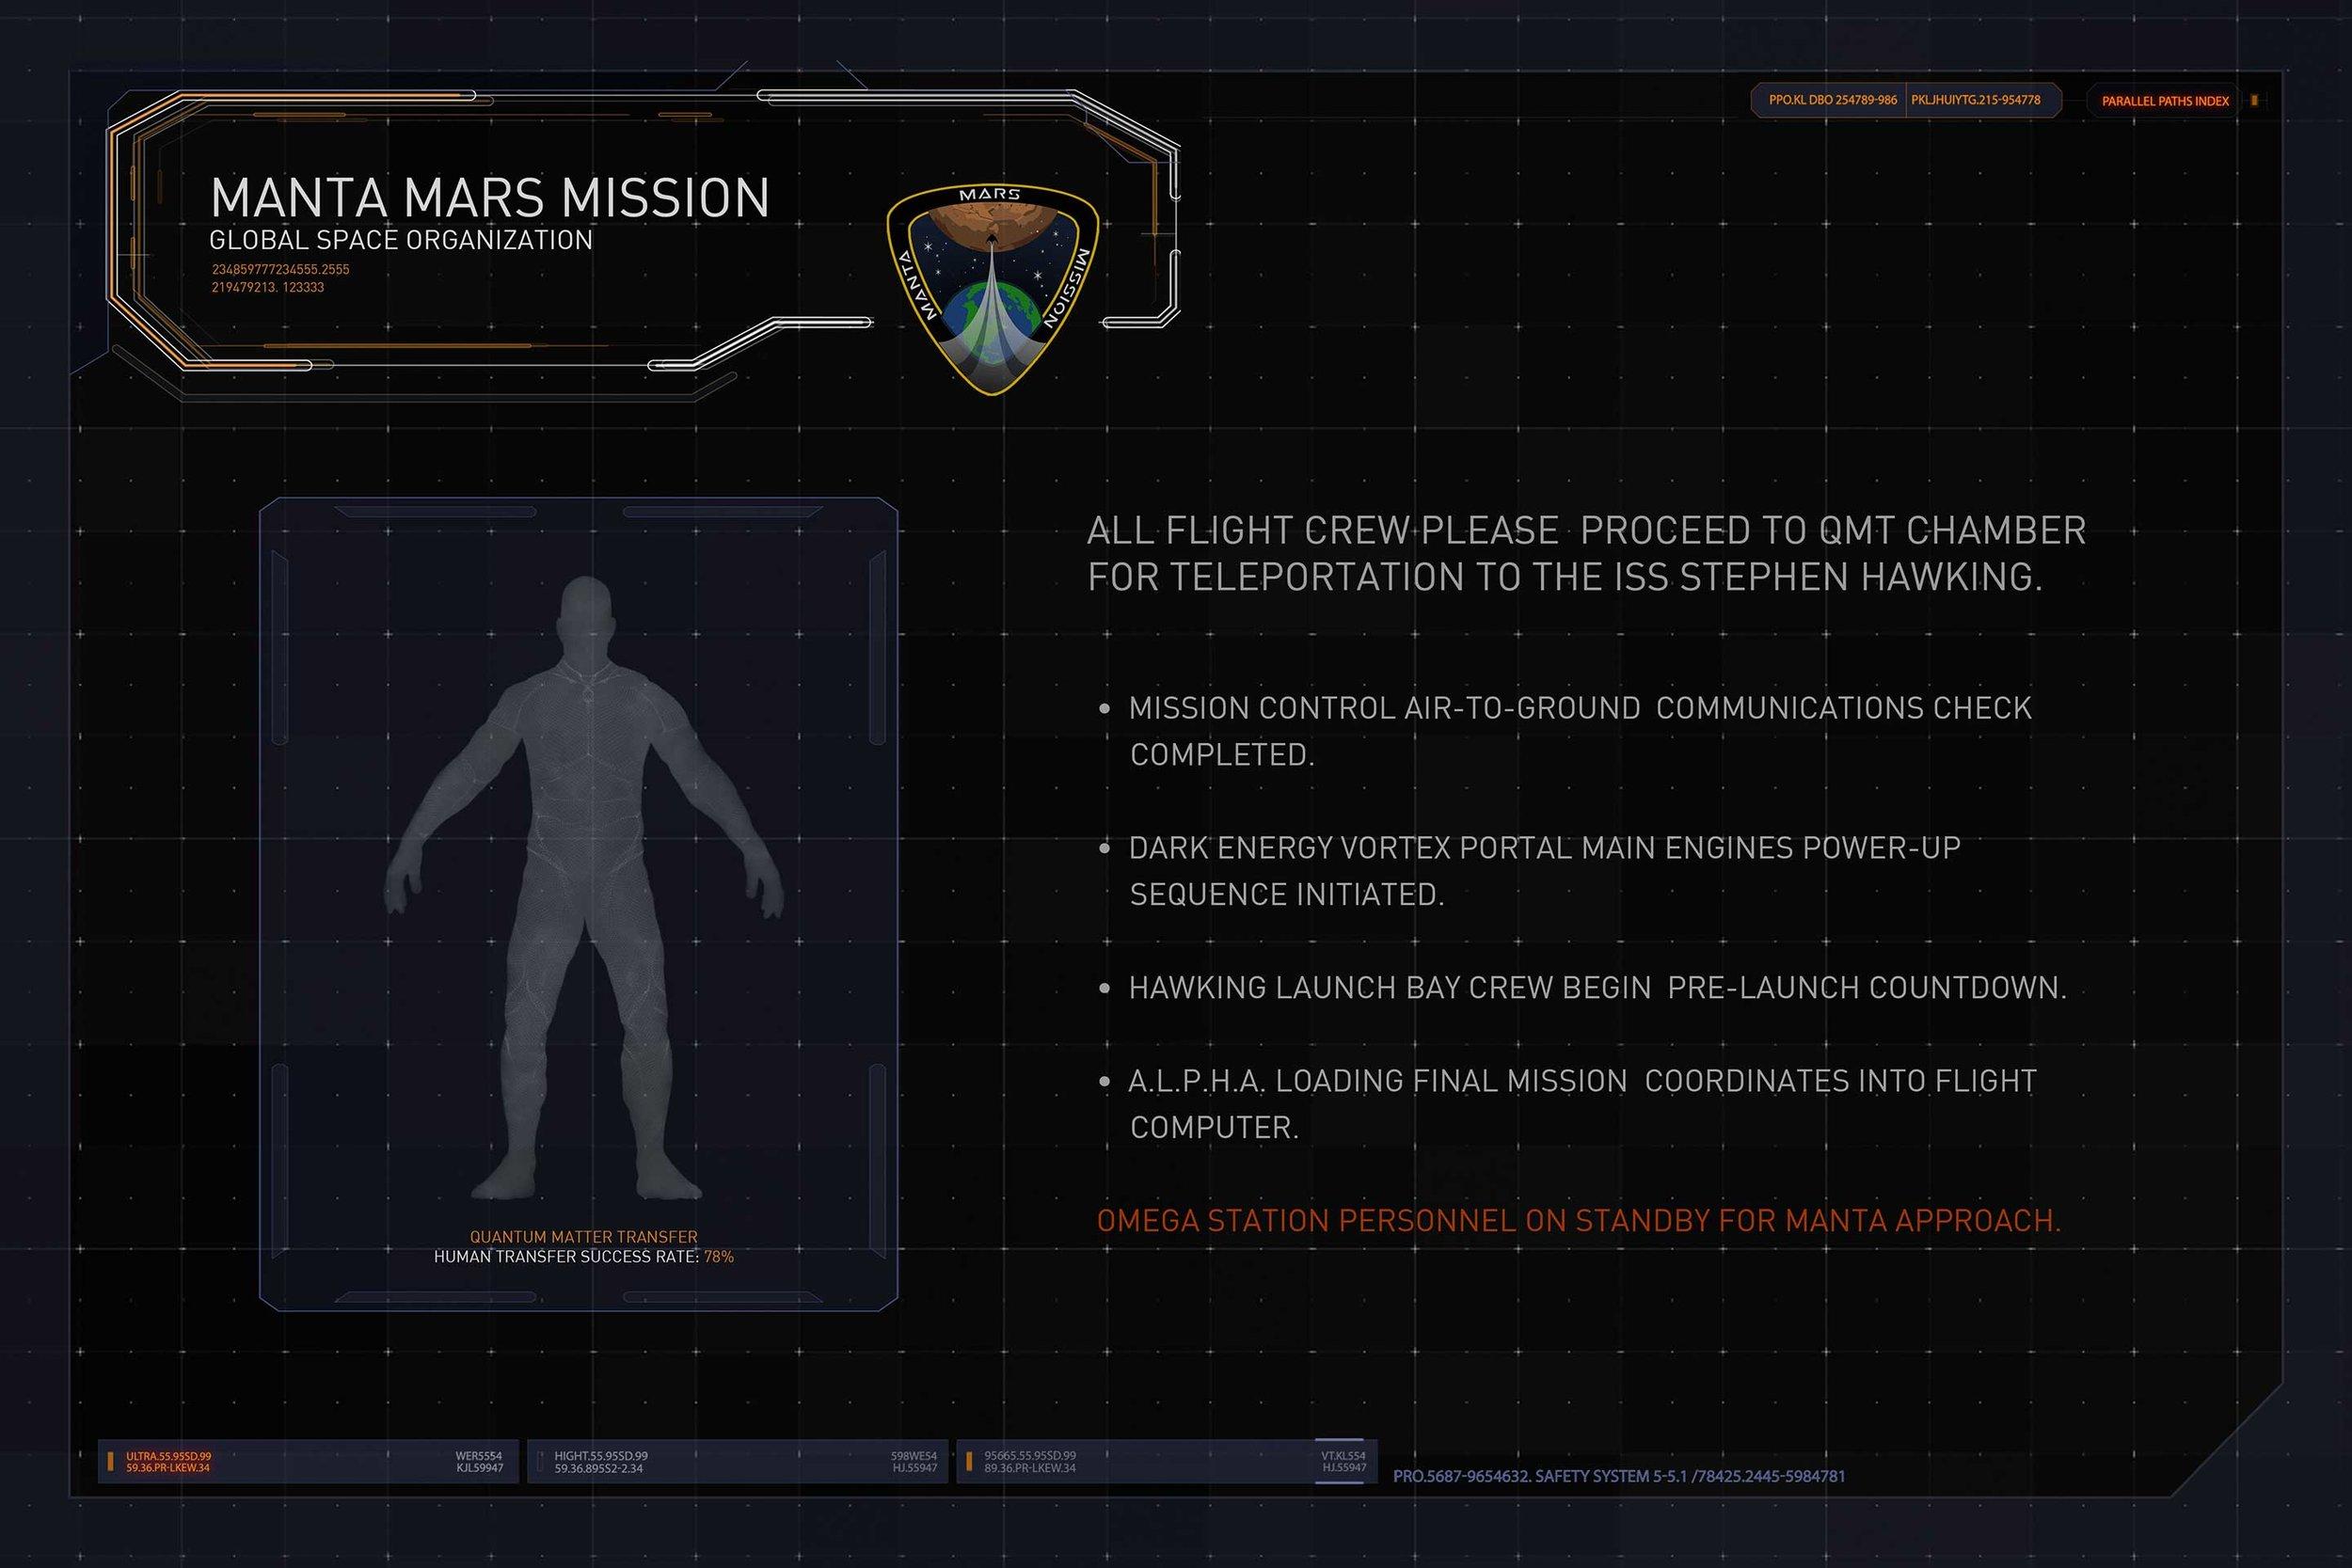 Q1_WallH_MissionStatusGraphic.jpg